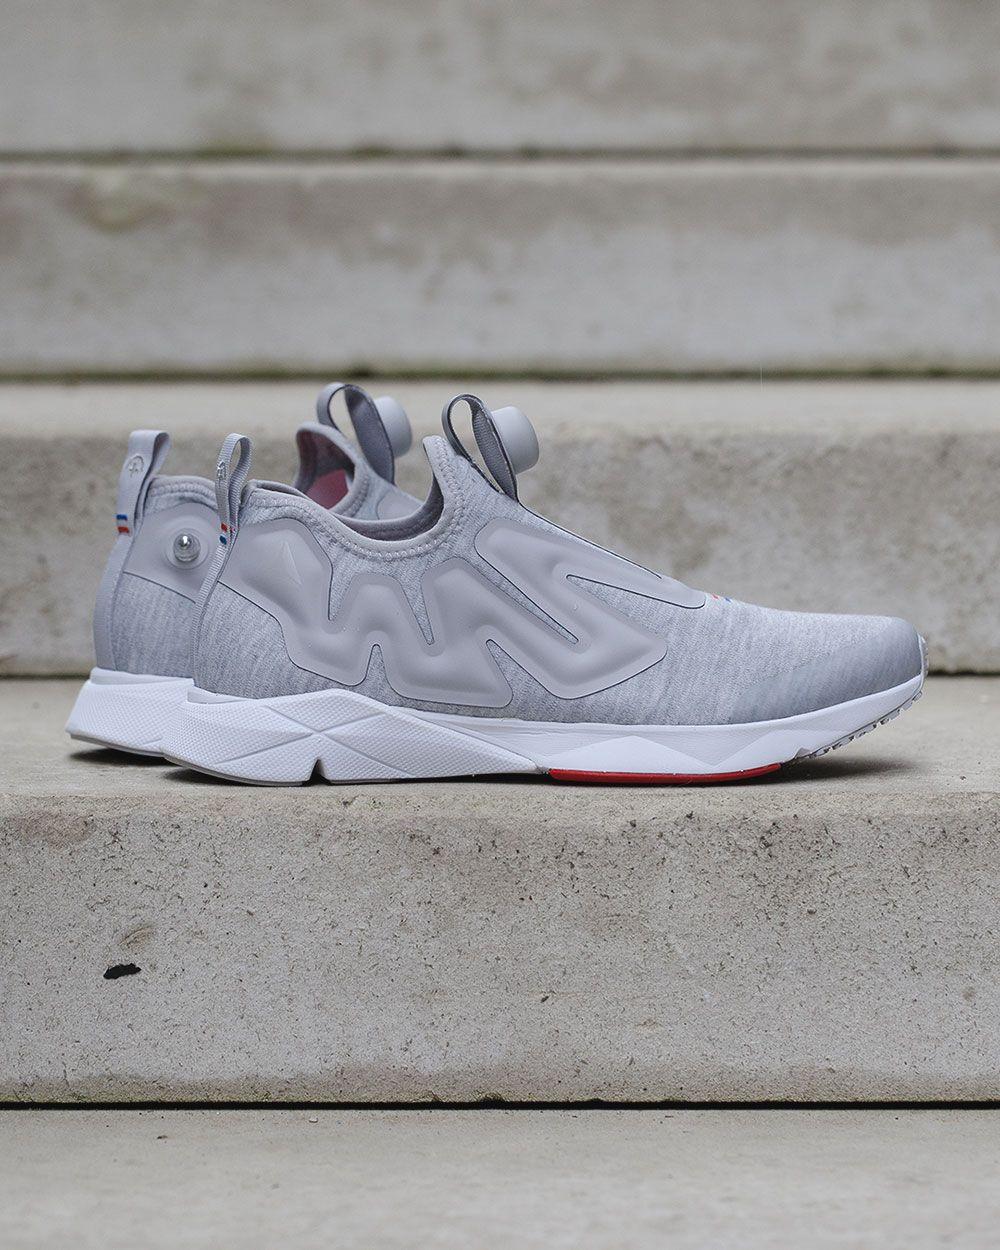 f0f35f8b2941 Reebok Pump Plus Supreme  Hoodie  Pack - EU Kicks  Sneaker Magazine